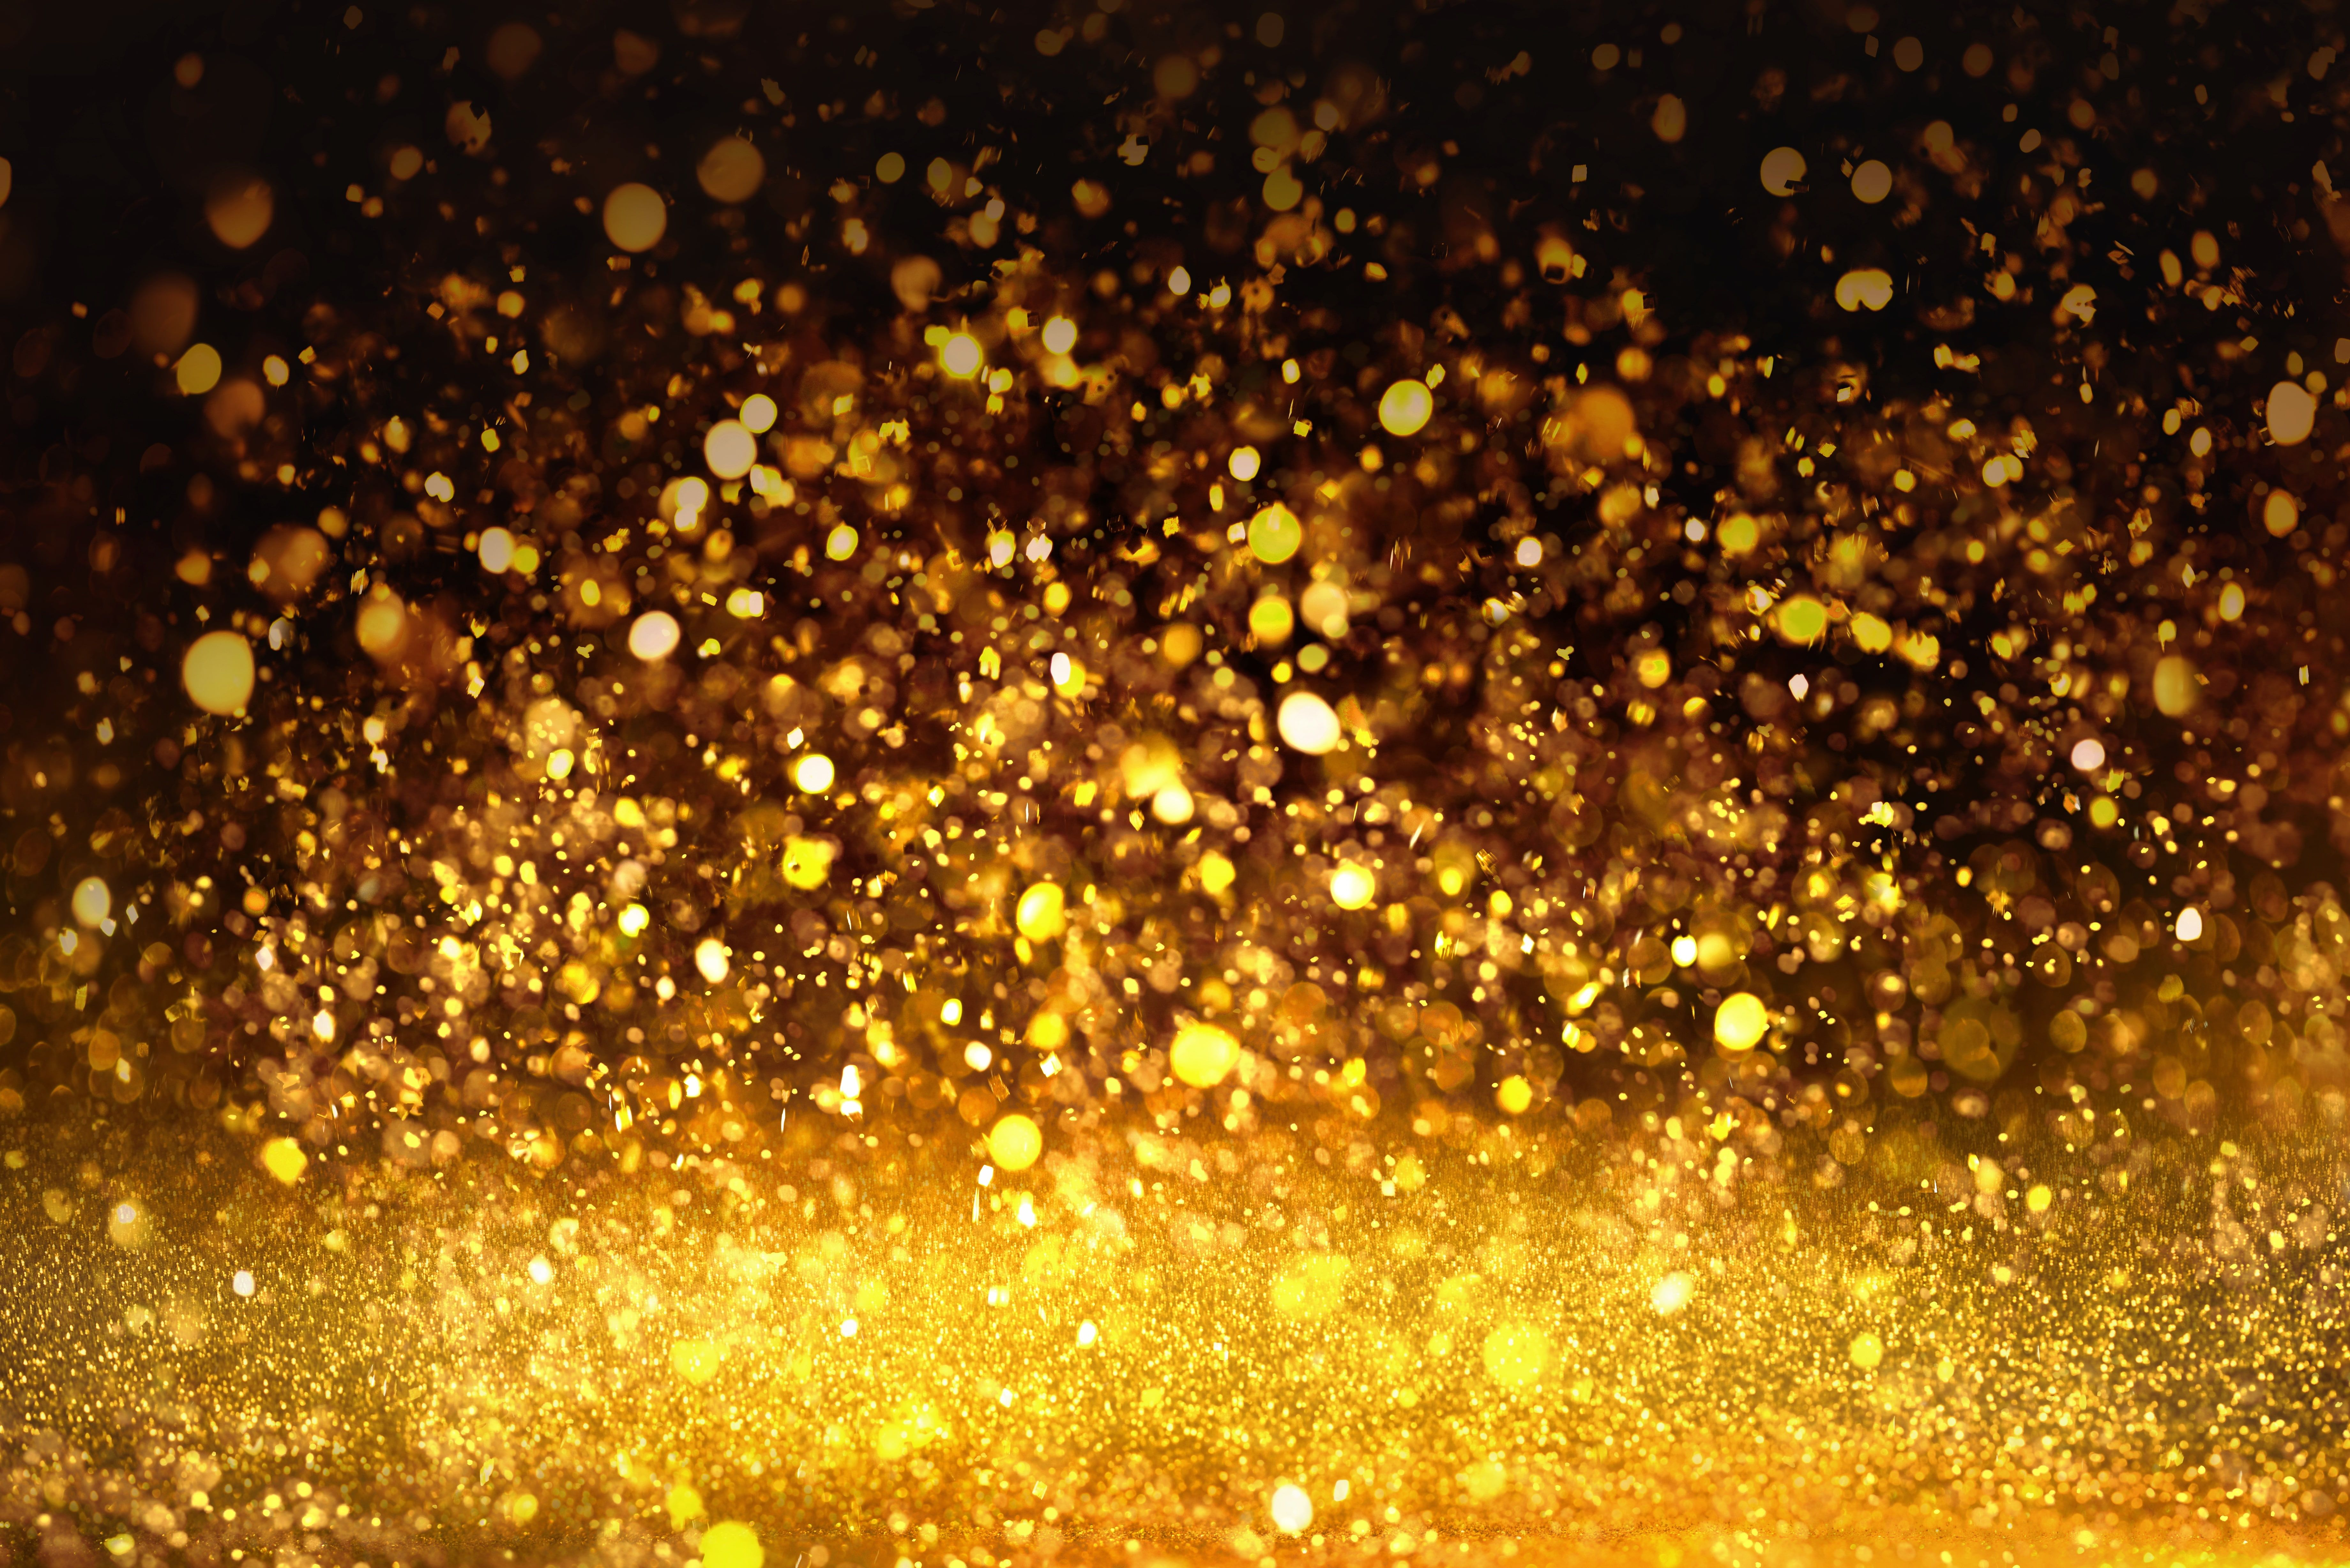 Background Sequins Golden Gold Texture Bokeh Bokeh Shine Glitter 5k Wallpaper Hdwallpaper Desktop Bokeh Texture Creative Background Bokeh